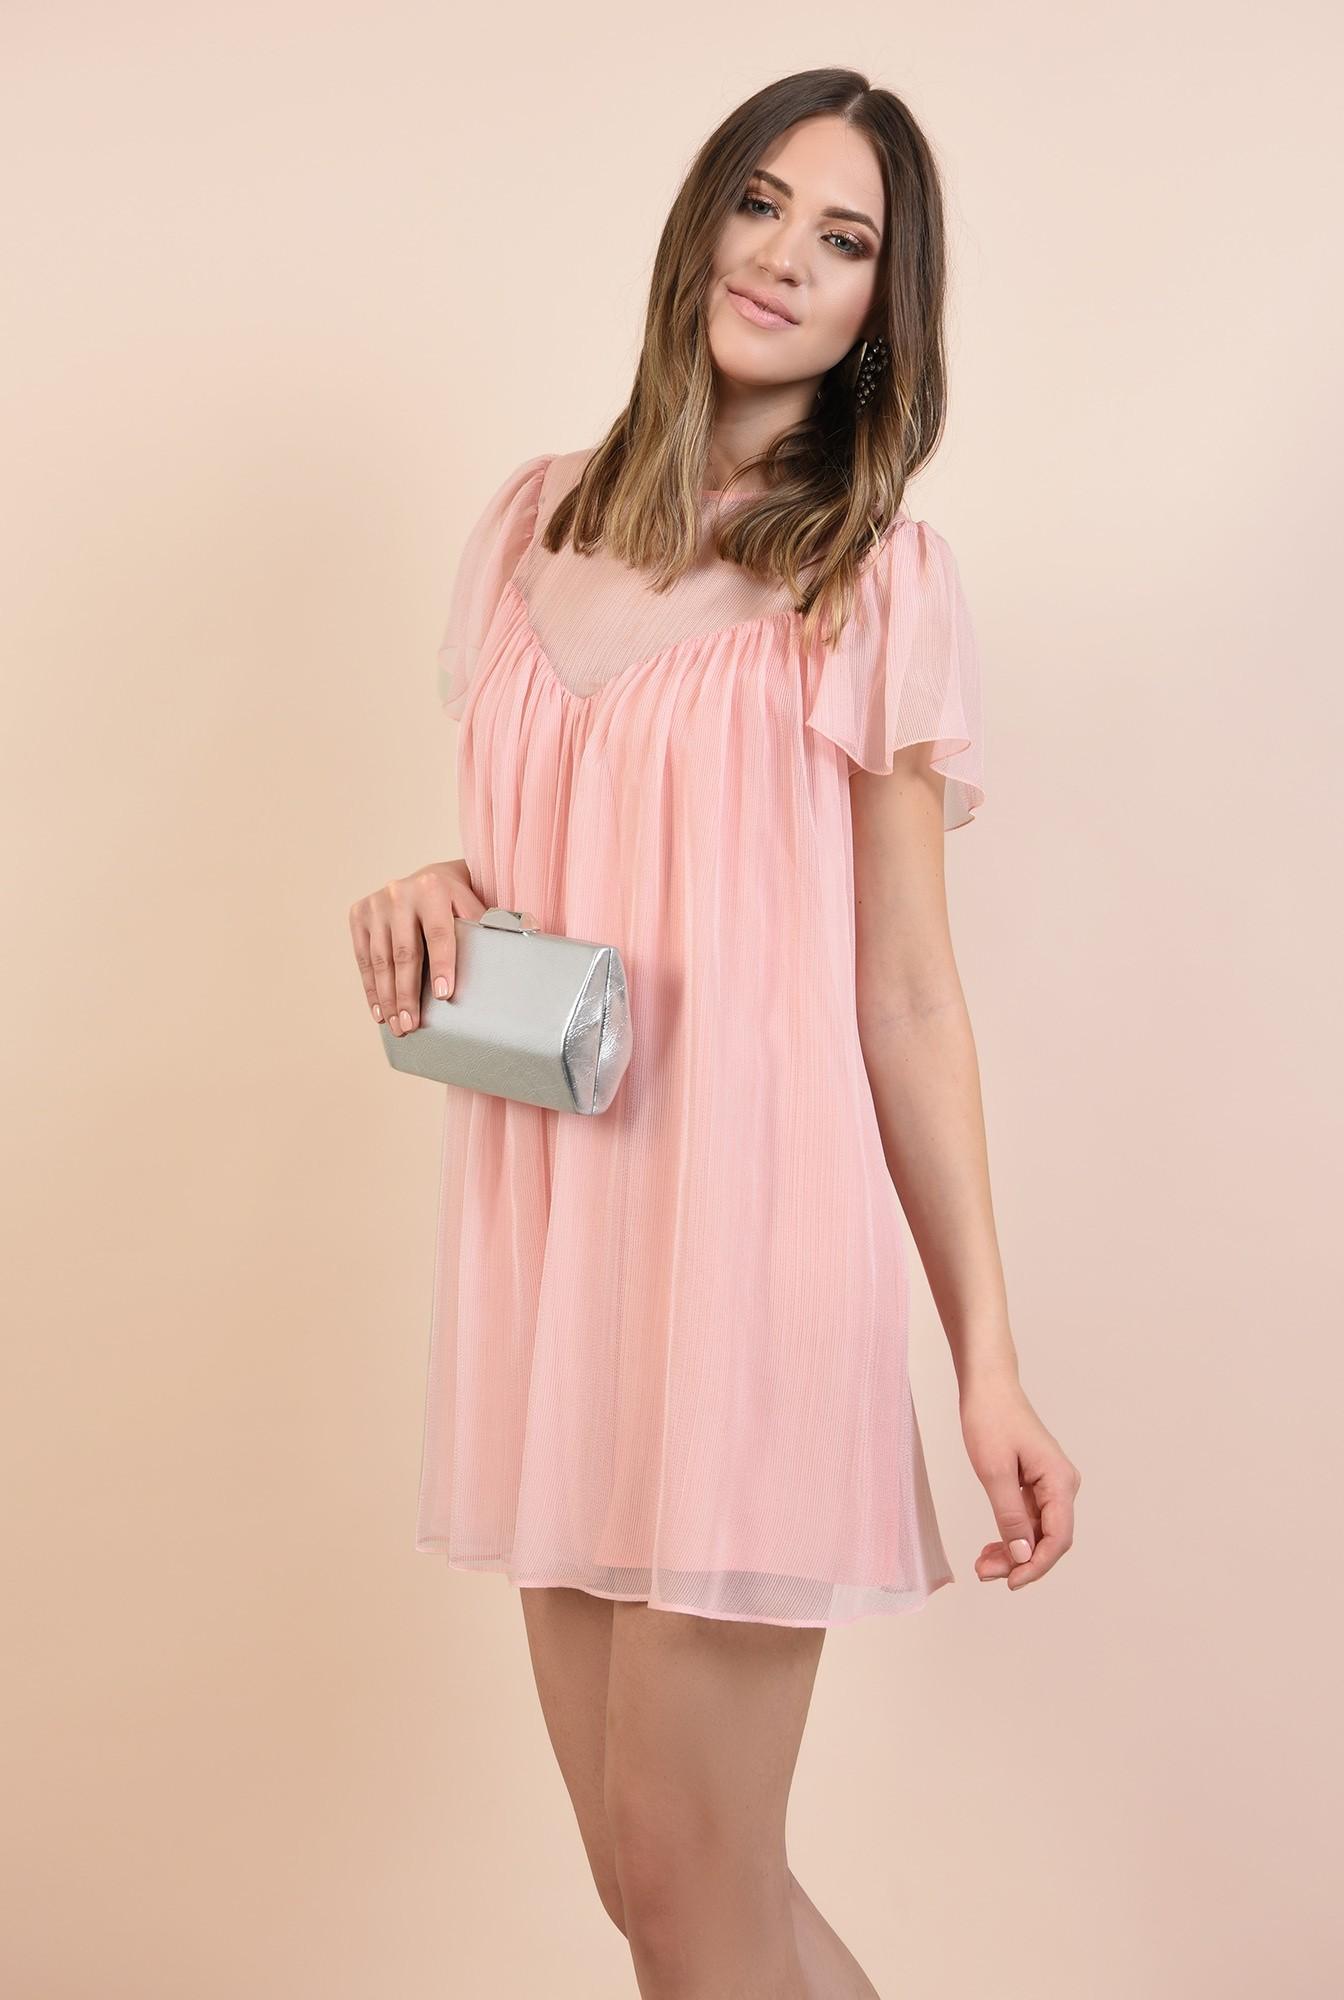 0 - 360 - rochie eleganta, din voal creponat, roz, mini, babydoll